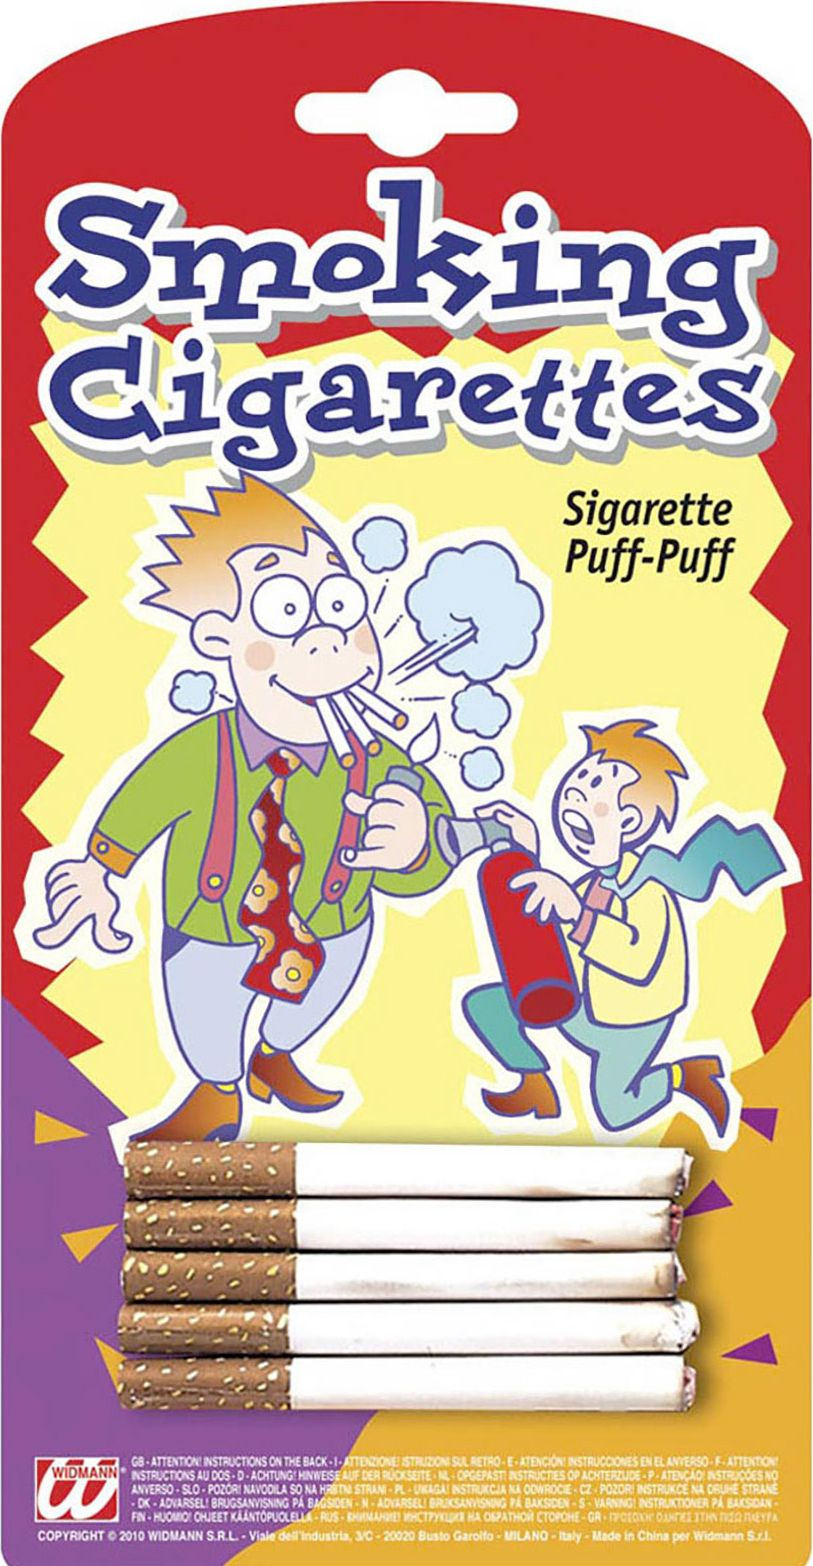 Nep sigaretten